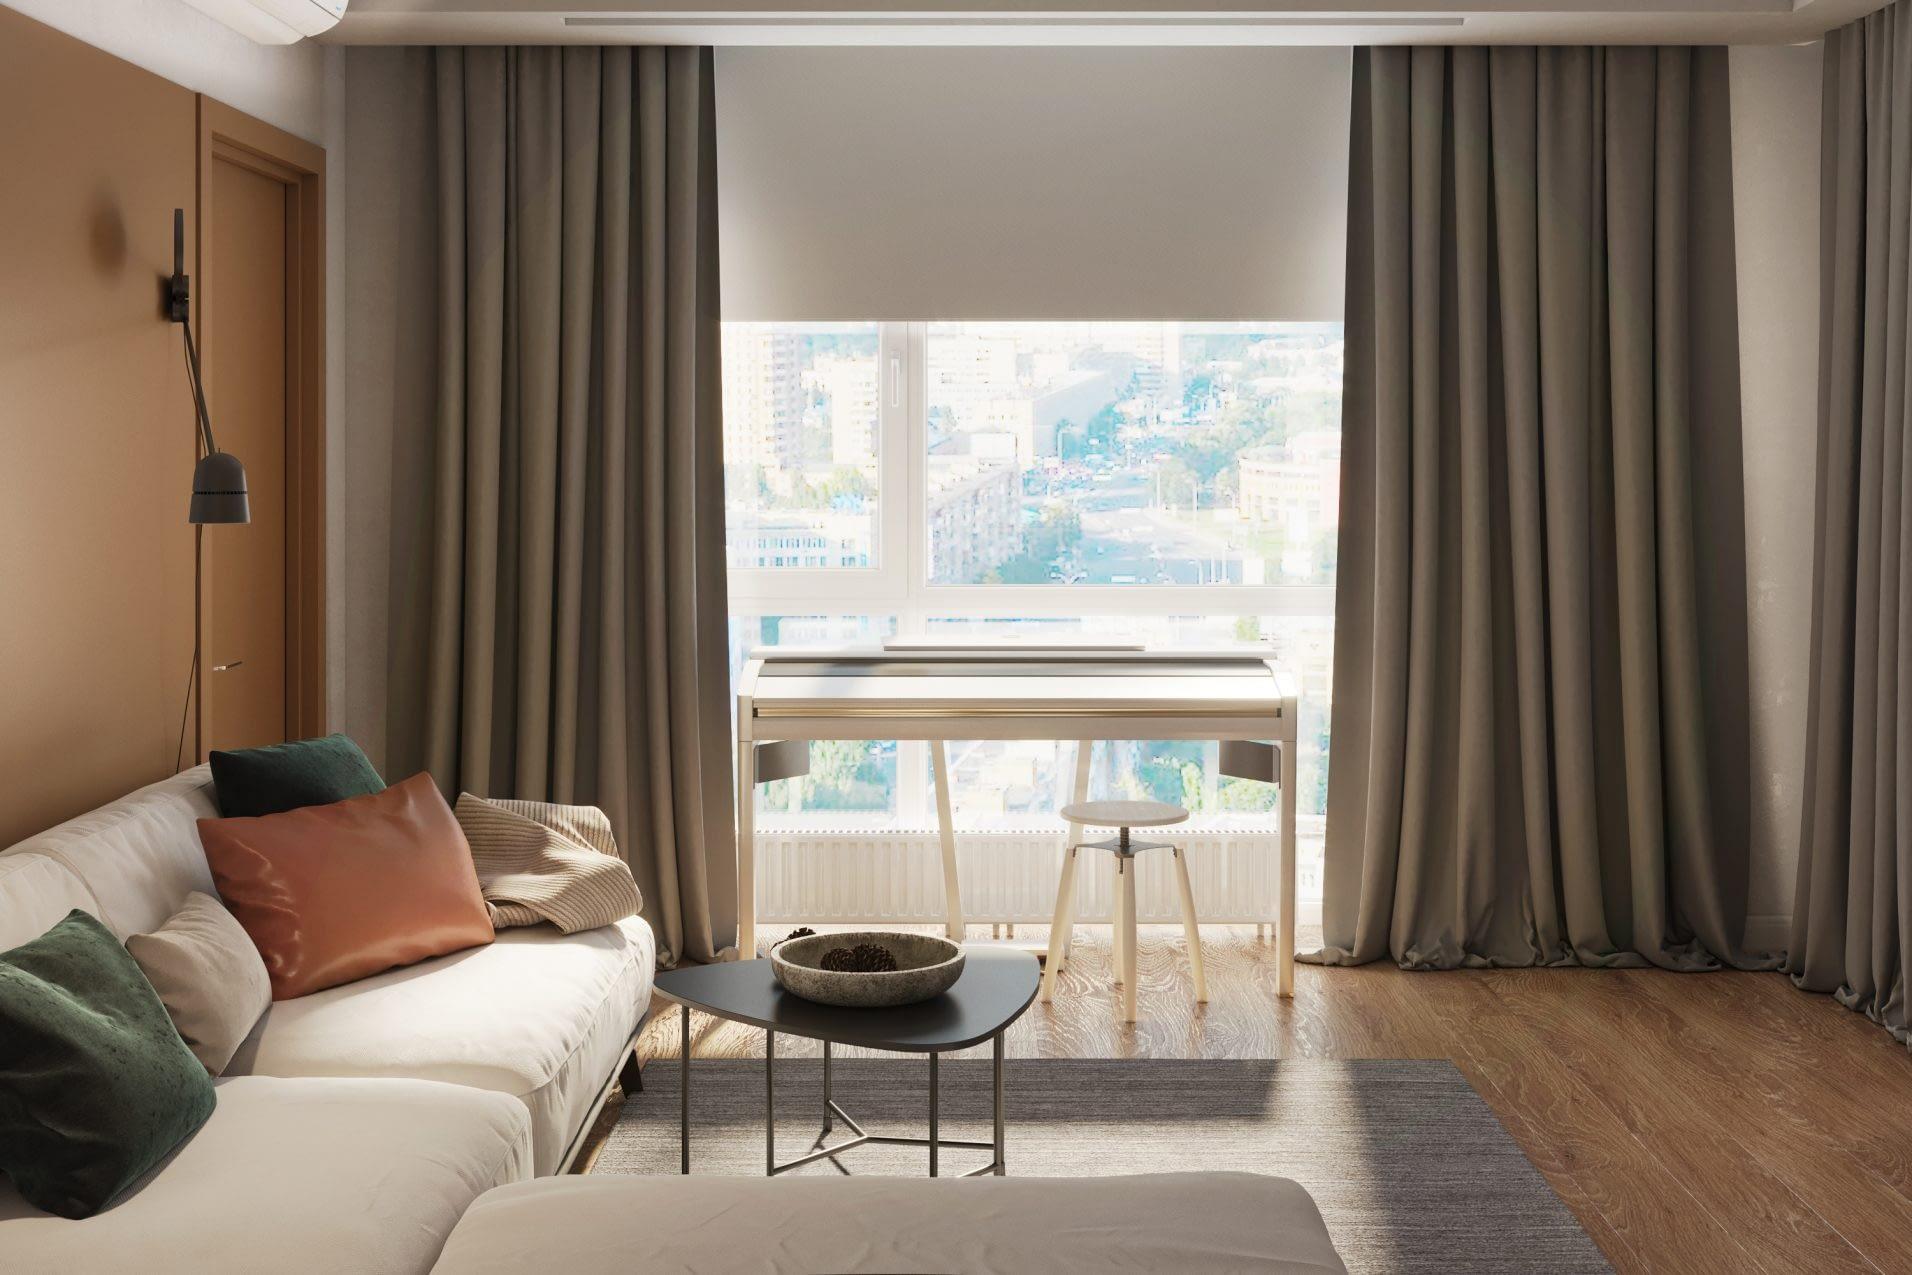 дизайн проект интерьера квартиры от Lavrov Design